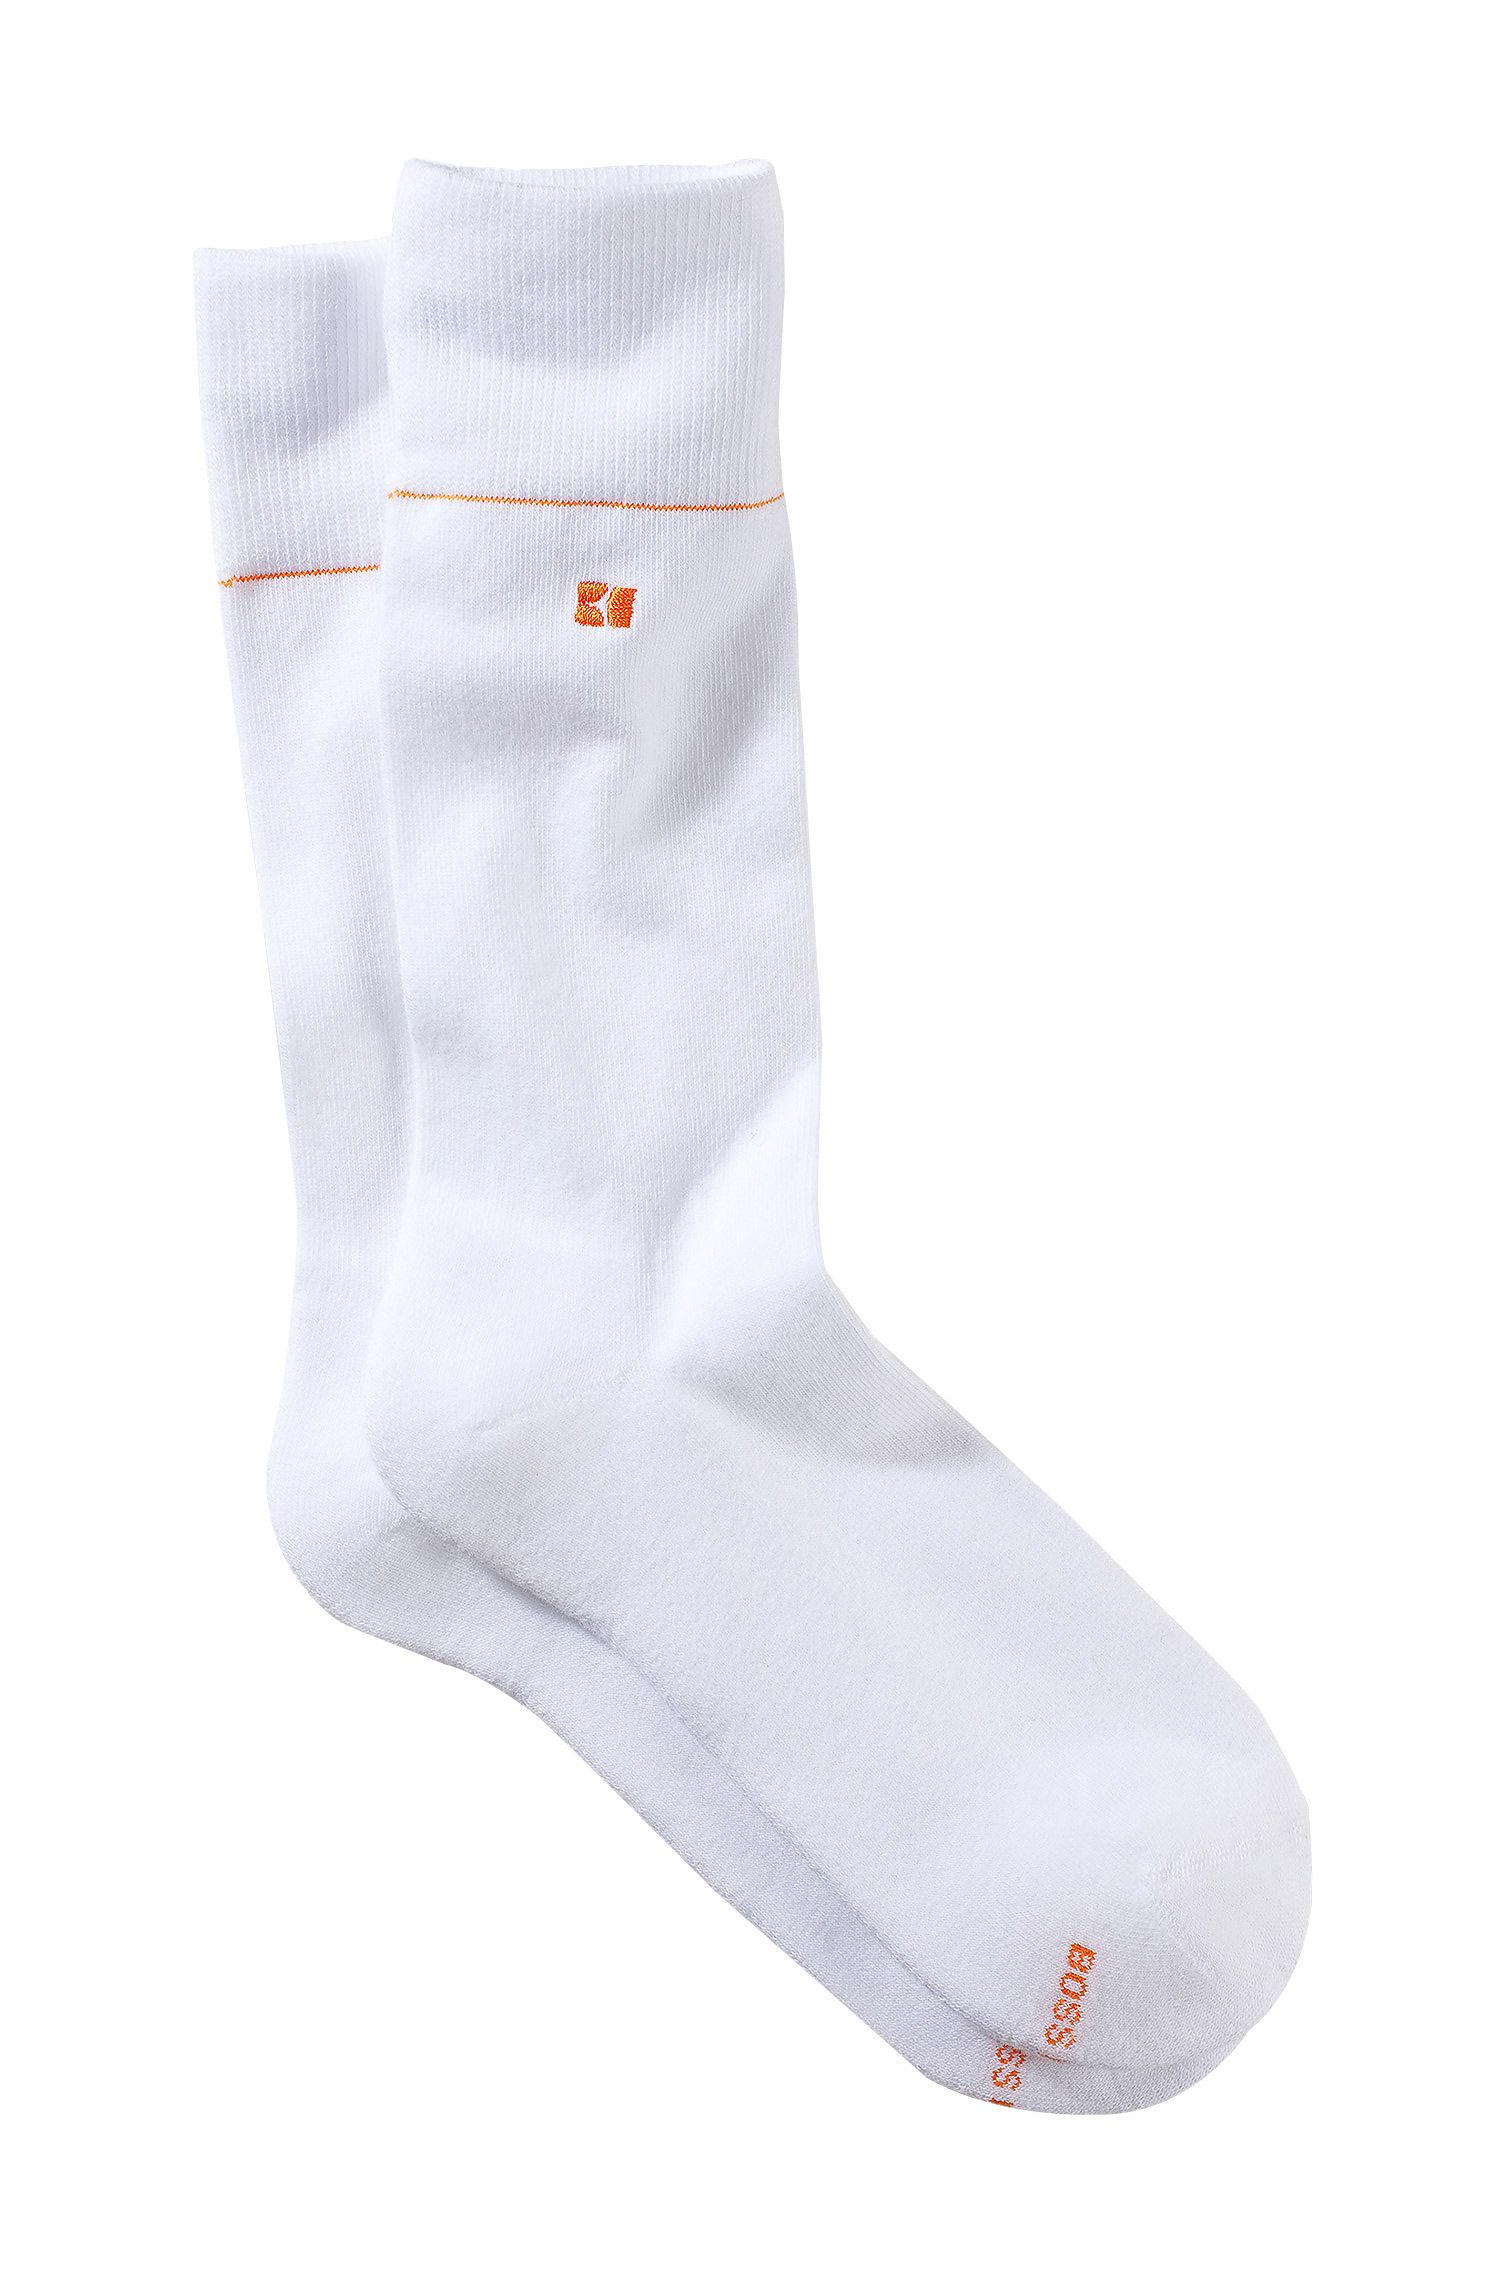 Cotton socks 'Axel RS Uni'